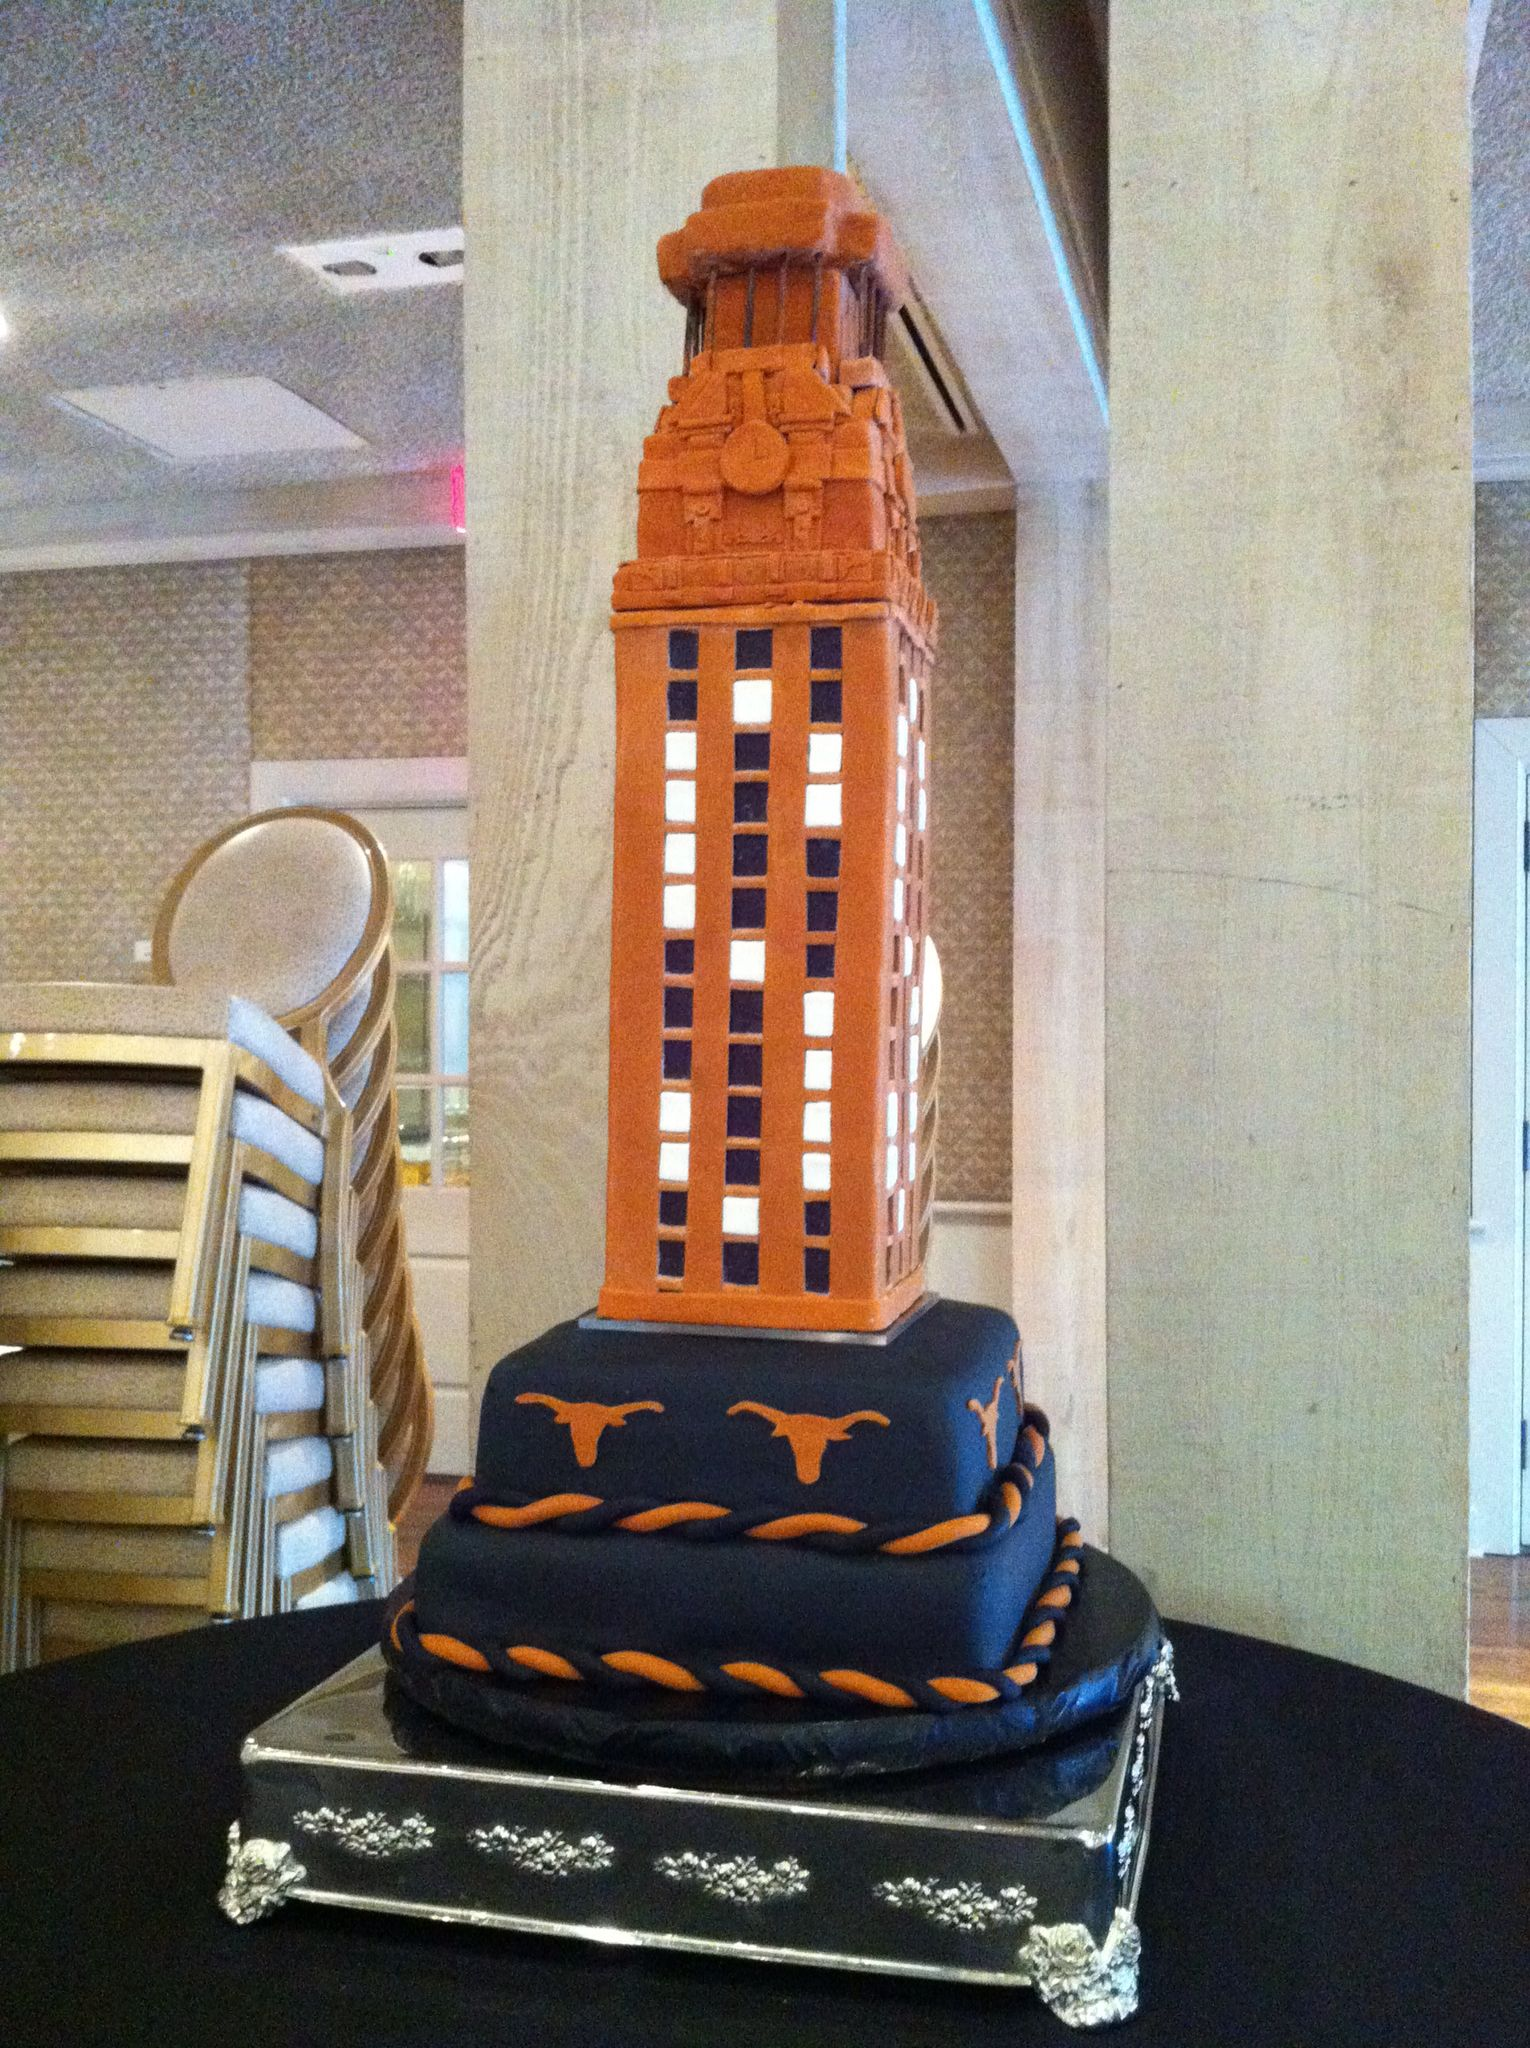 Skyscraper grooms cake